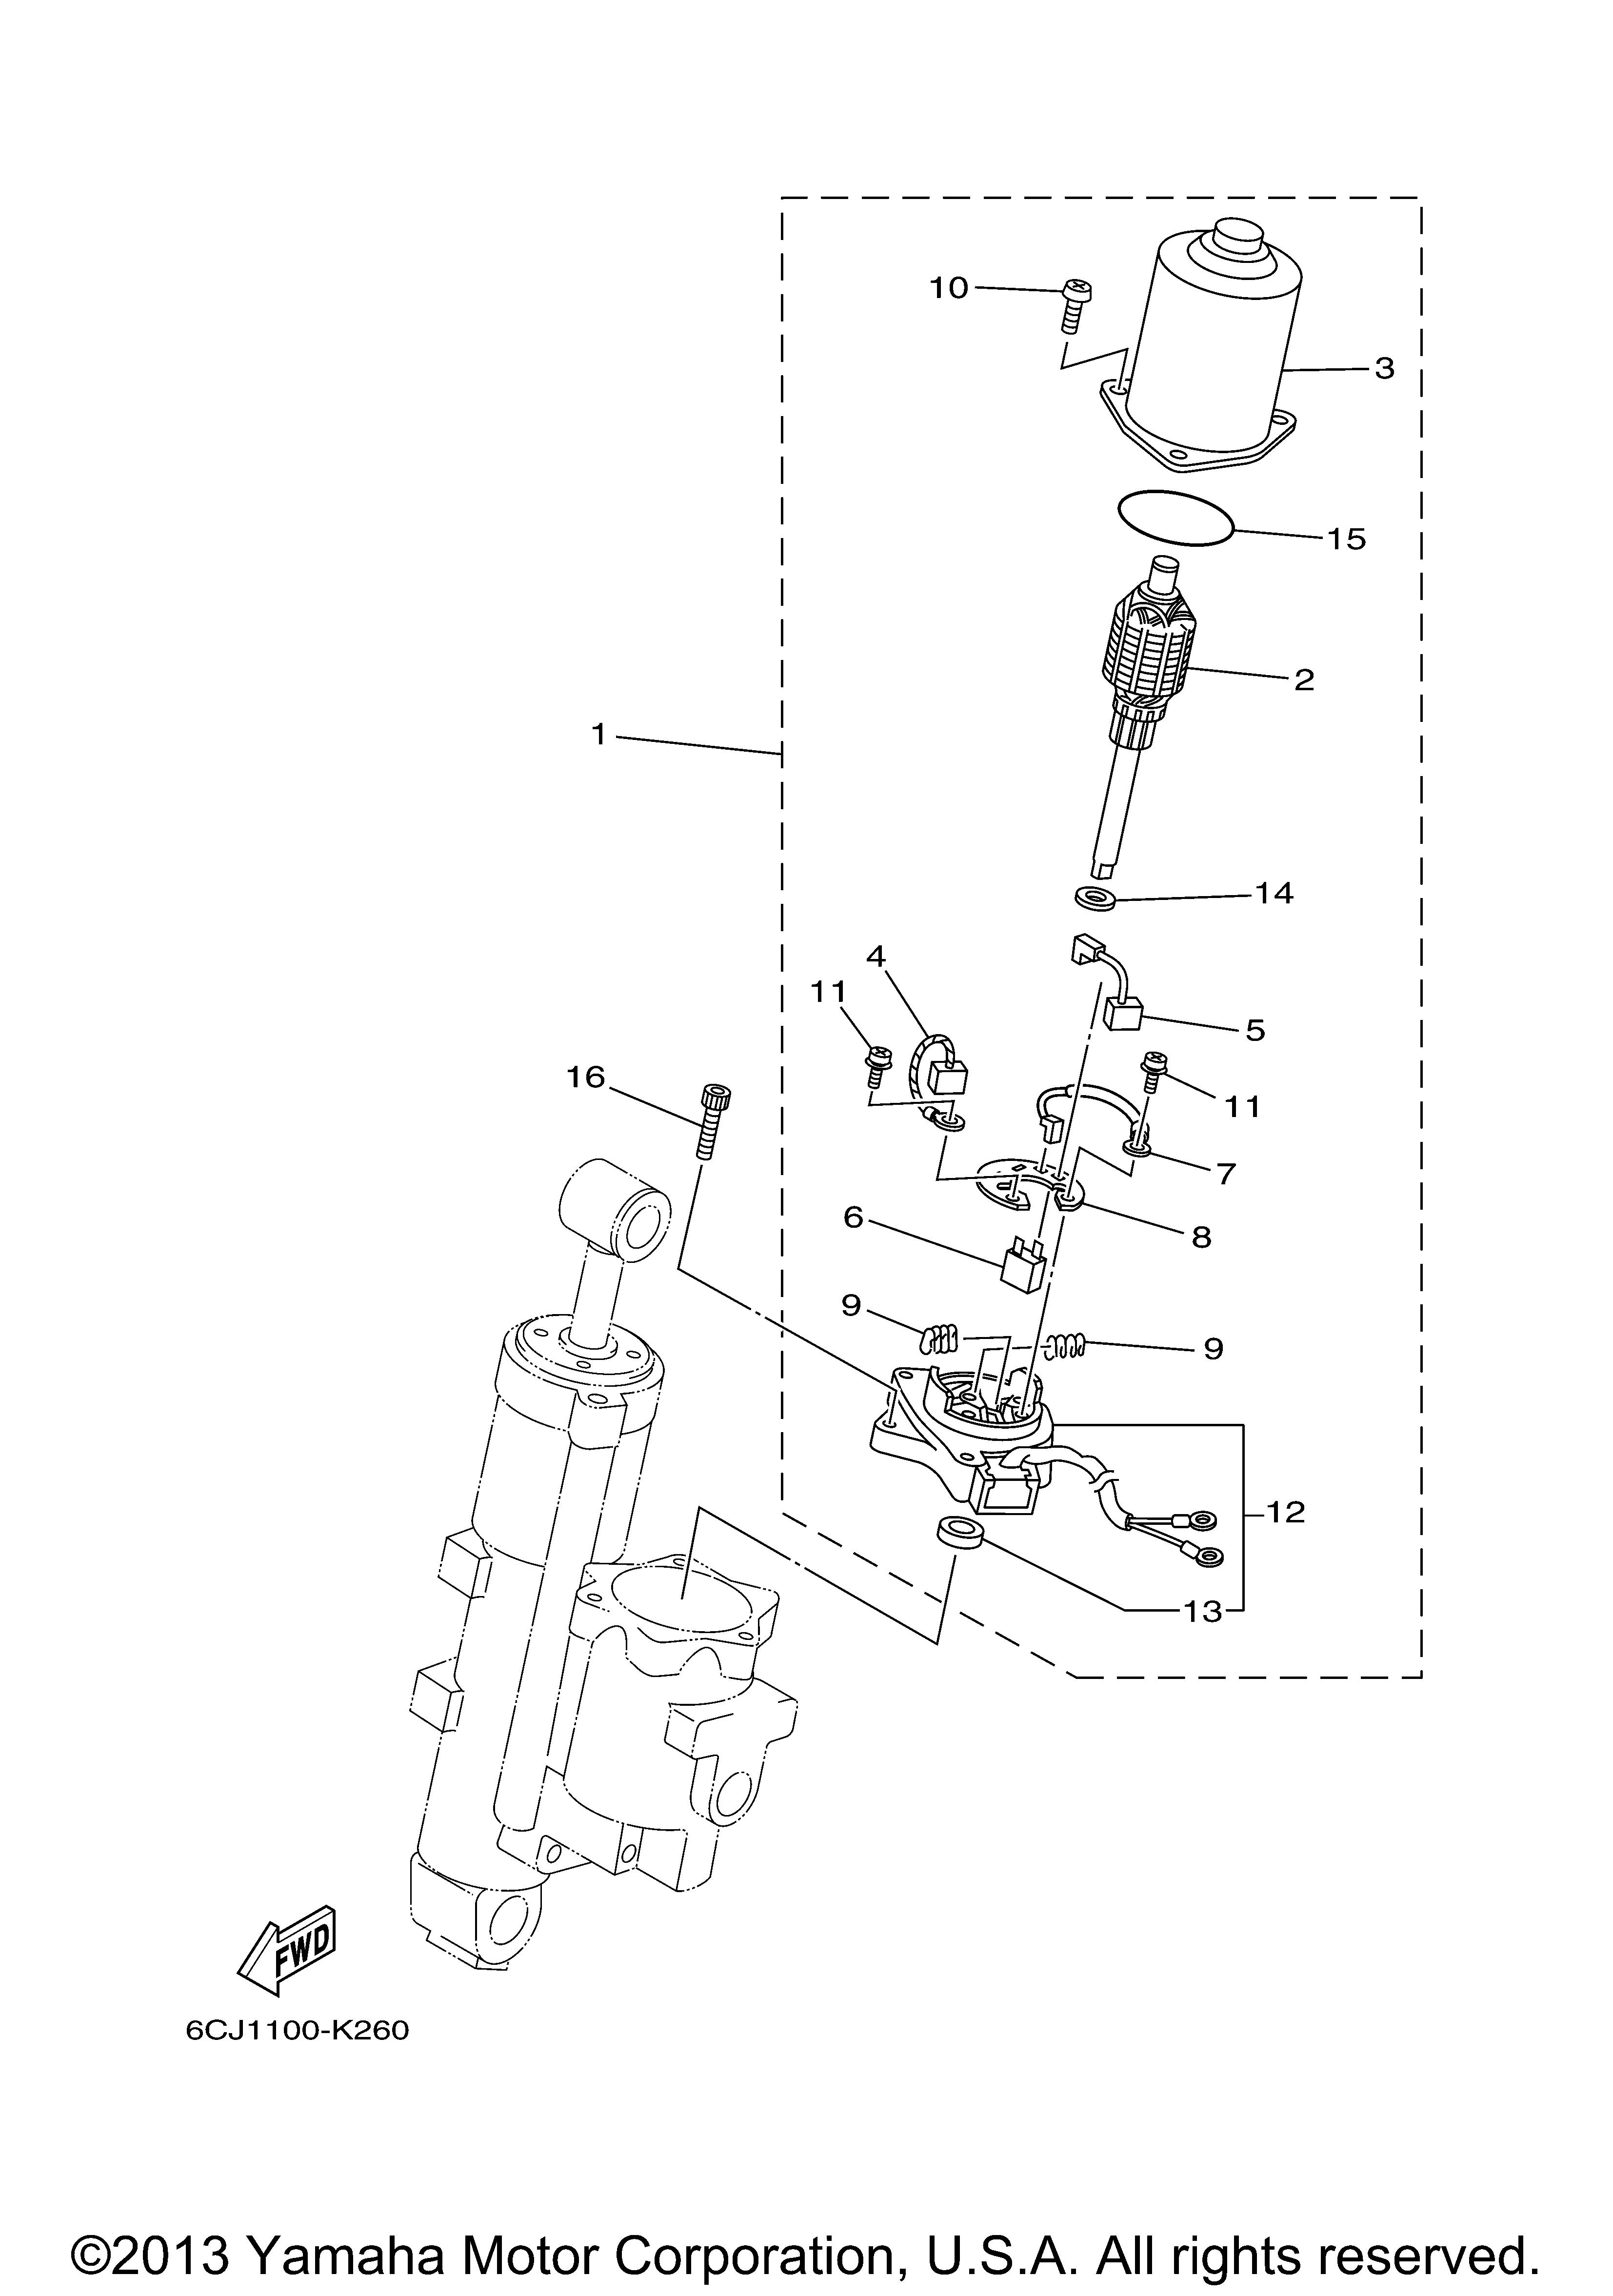 Yamaha 70 Hp Outboard Motor Parts Diagram Moreover Engine Diagram